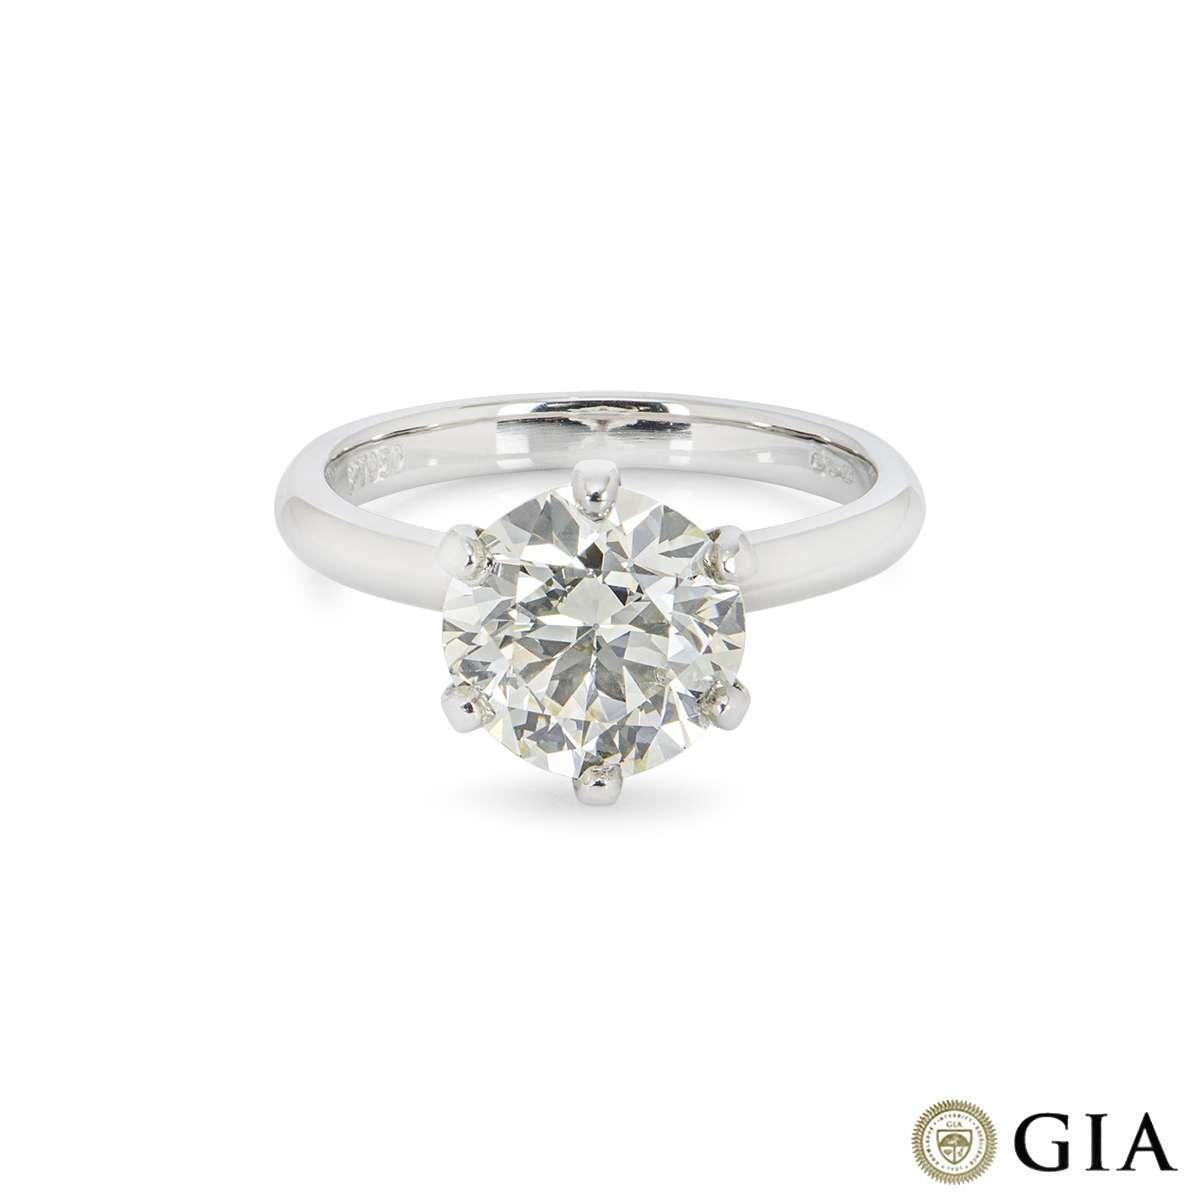 Round Brilliant Cut Diamond Ring 2.71ct N/VS1